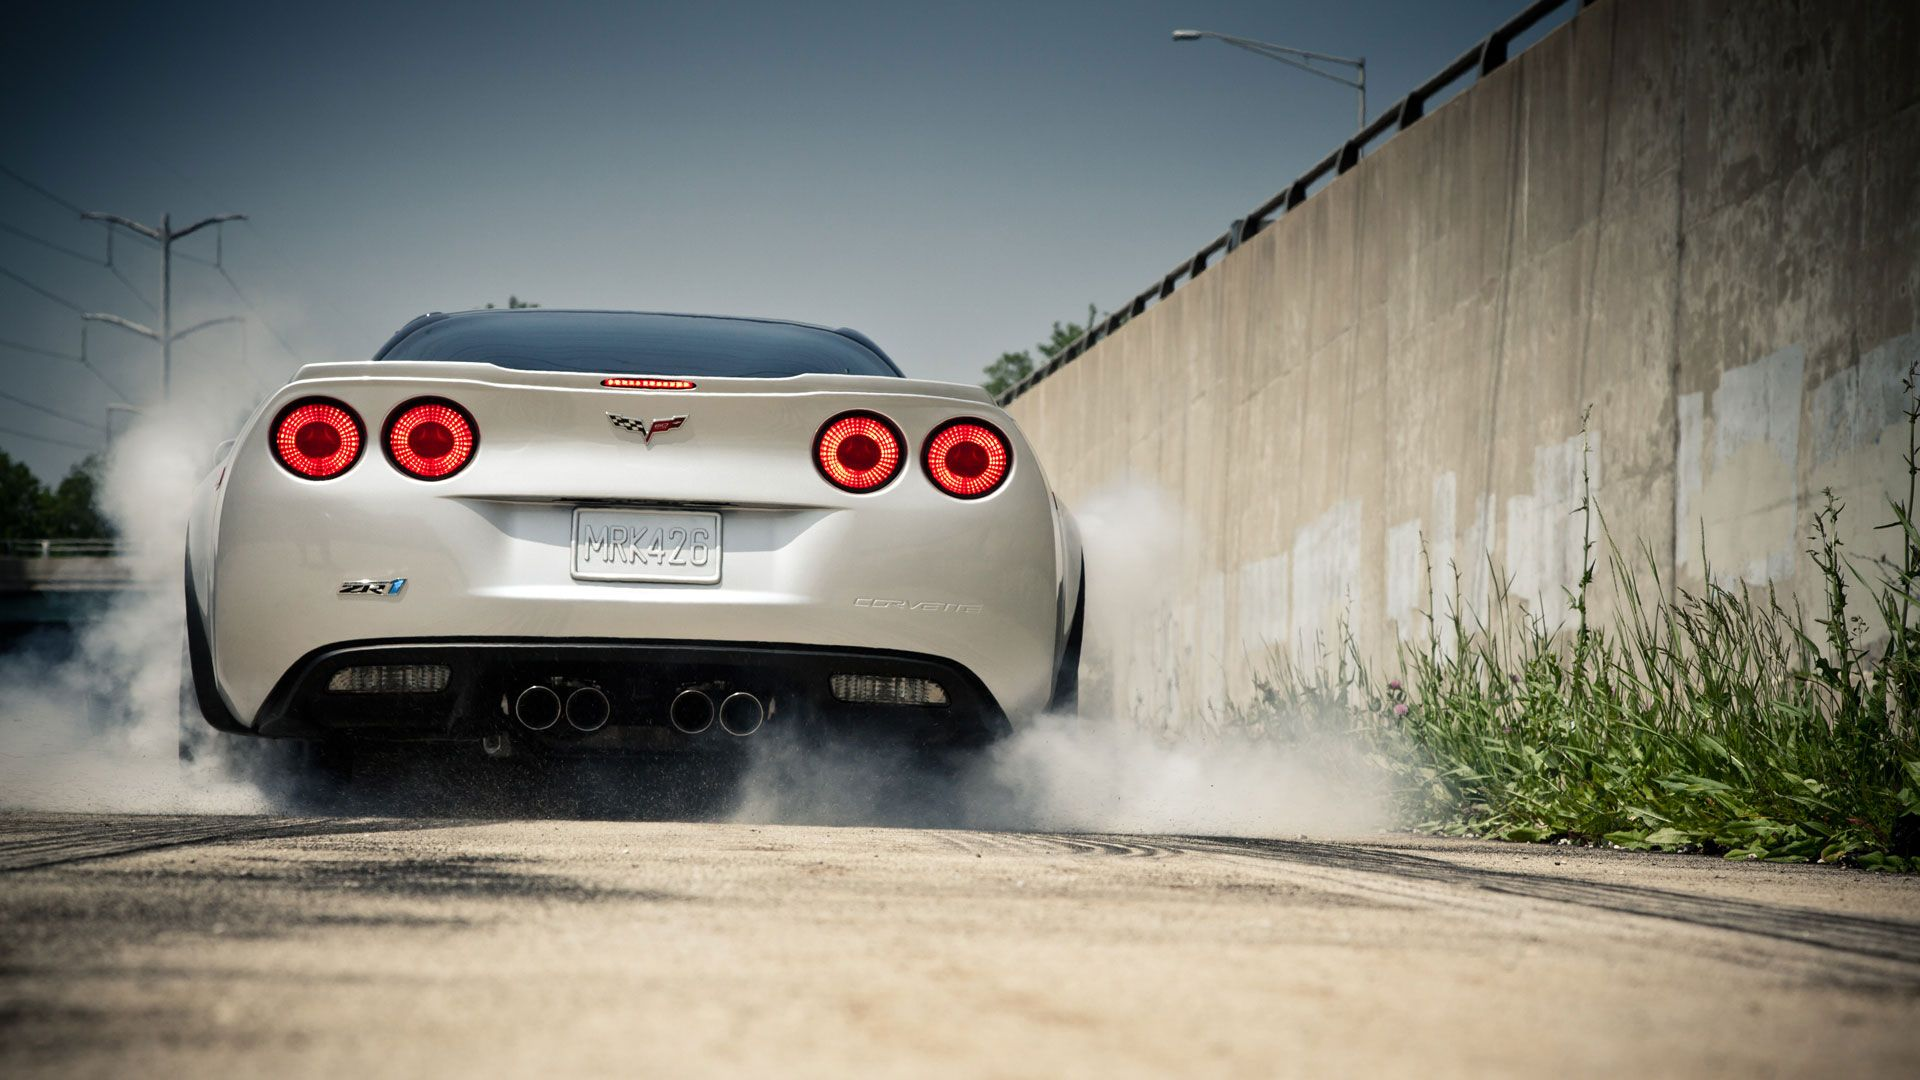 C6 Corvette Wallpapers Top Free C6 Corvette Backgrounds Wallpaperaccess